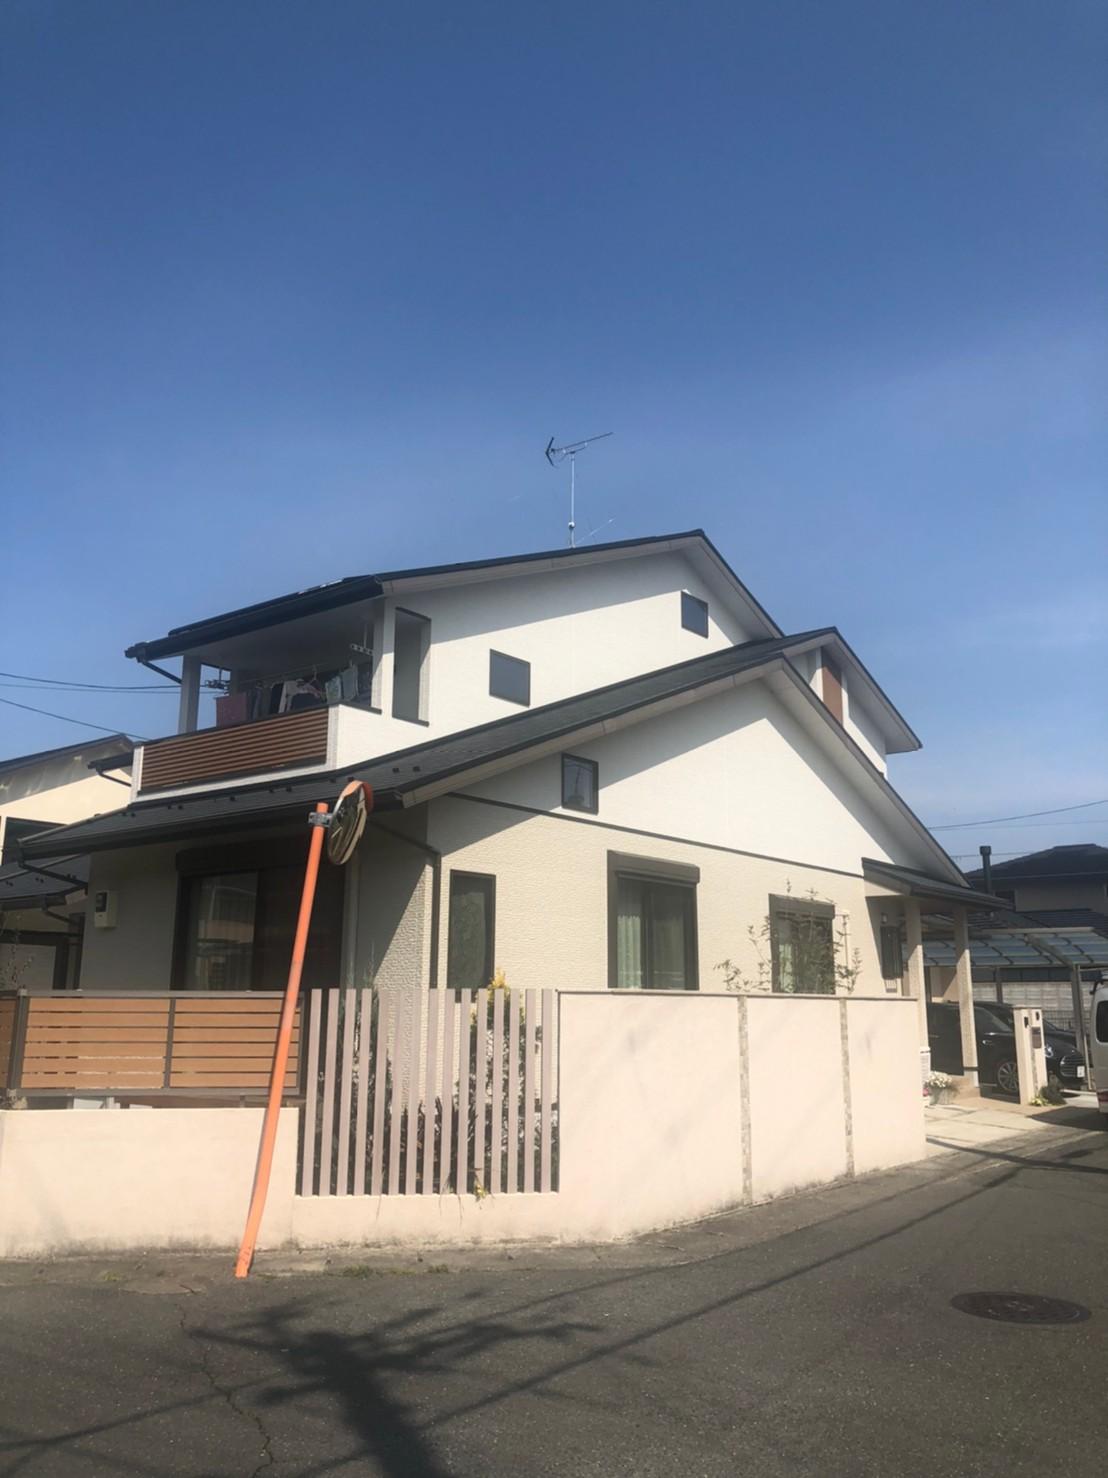 京都府左京区 BSCS4K8Kアンテナ追加取付設置工事